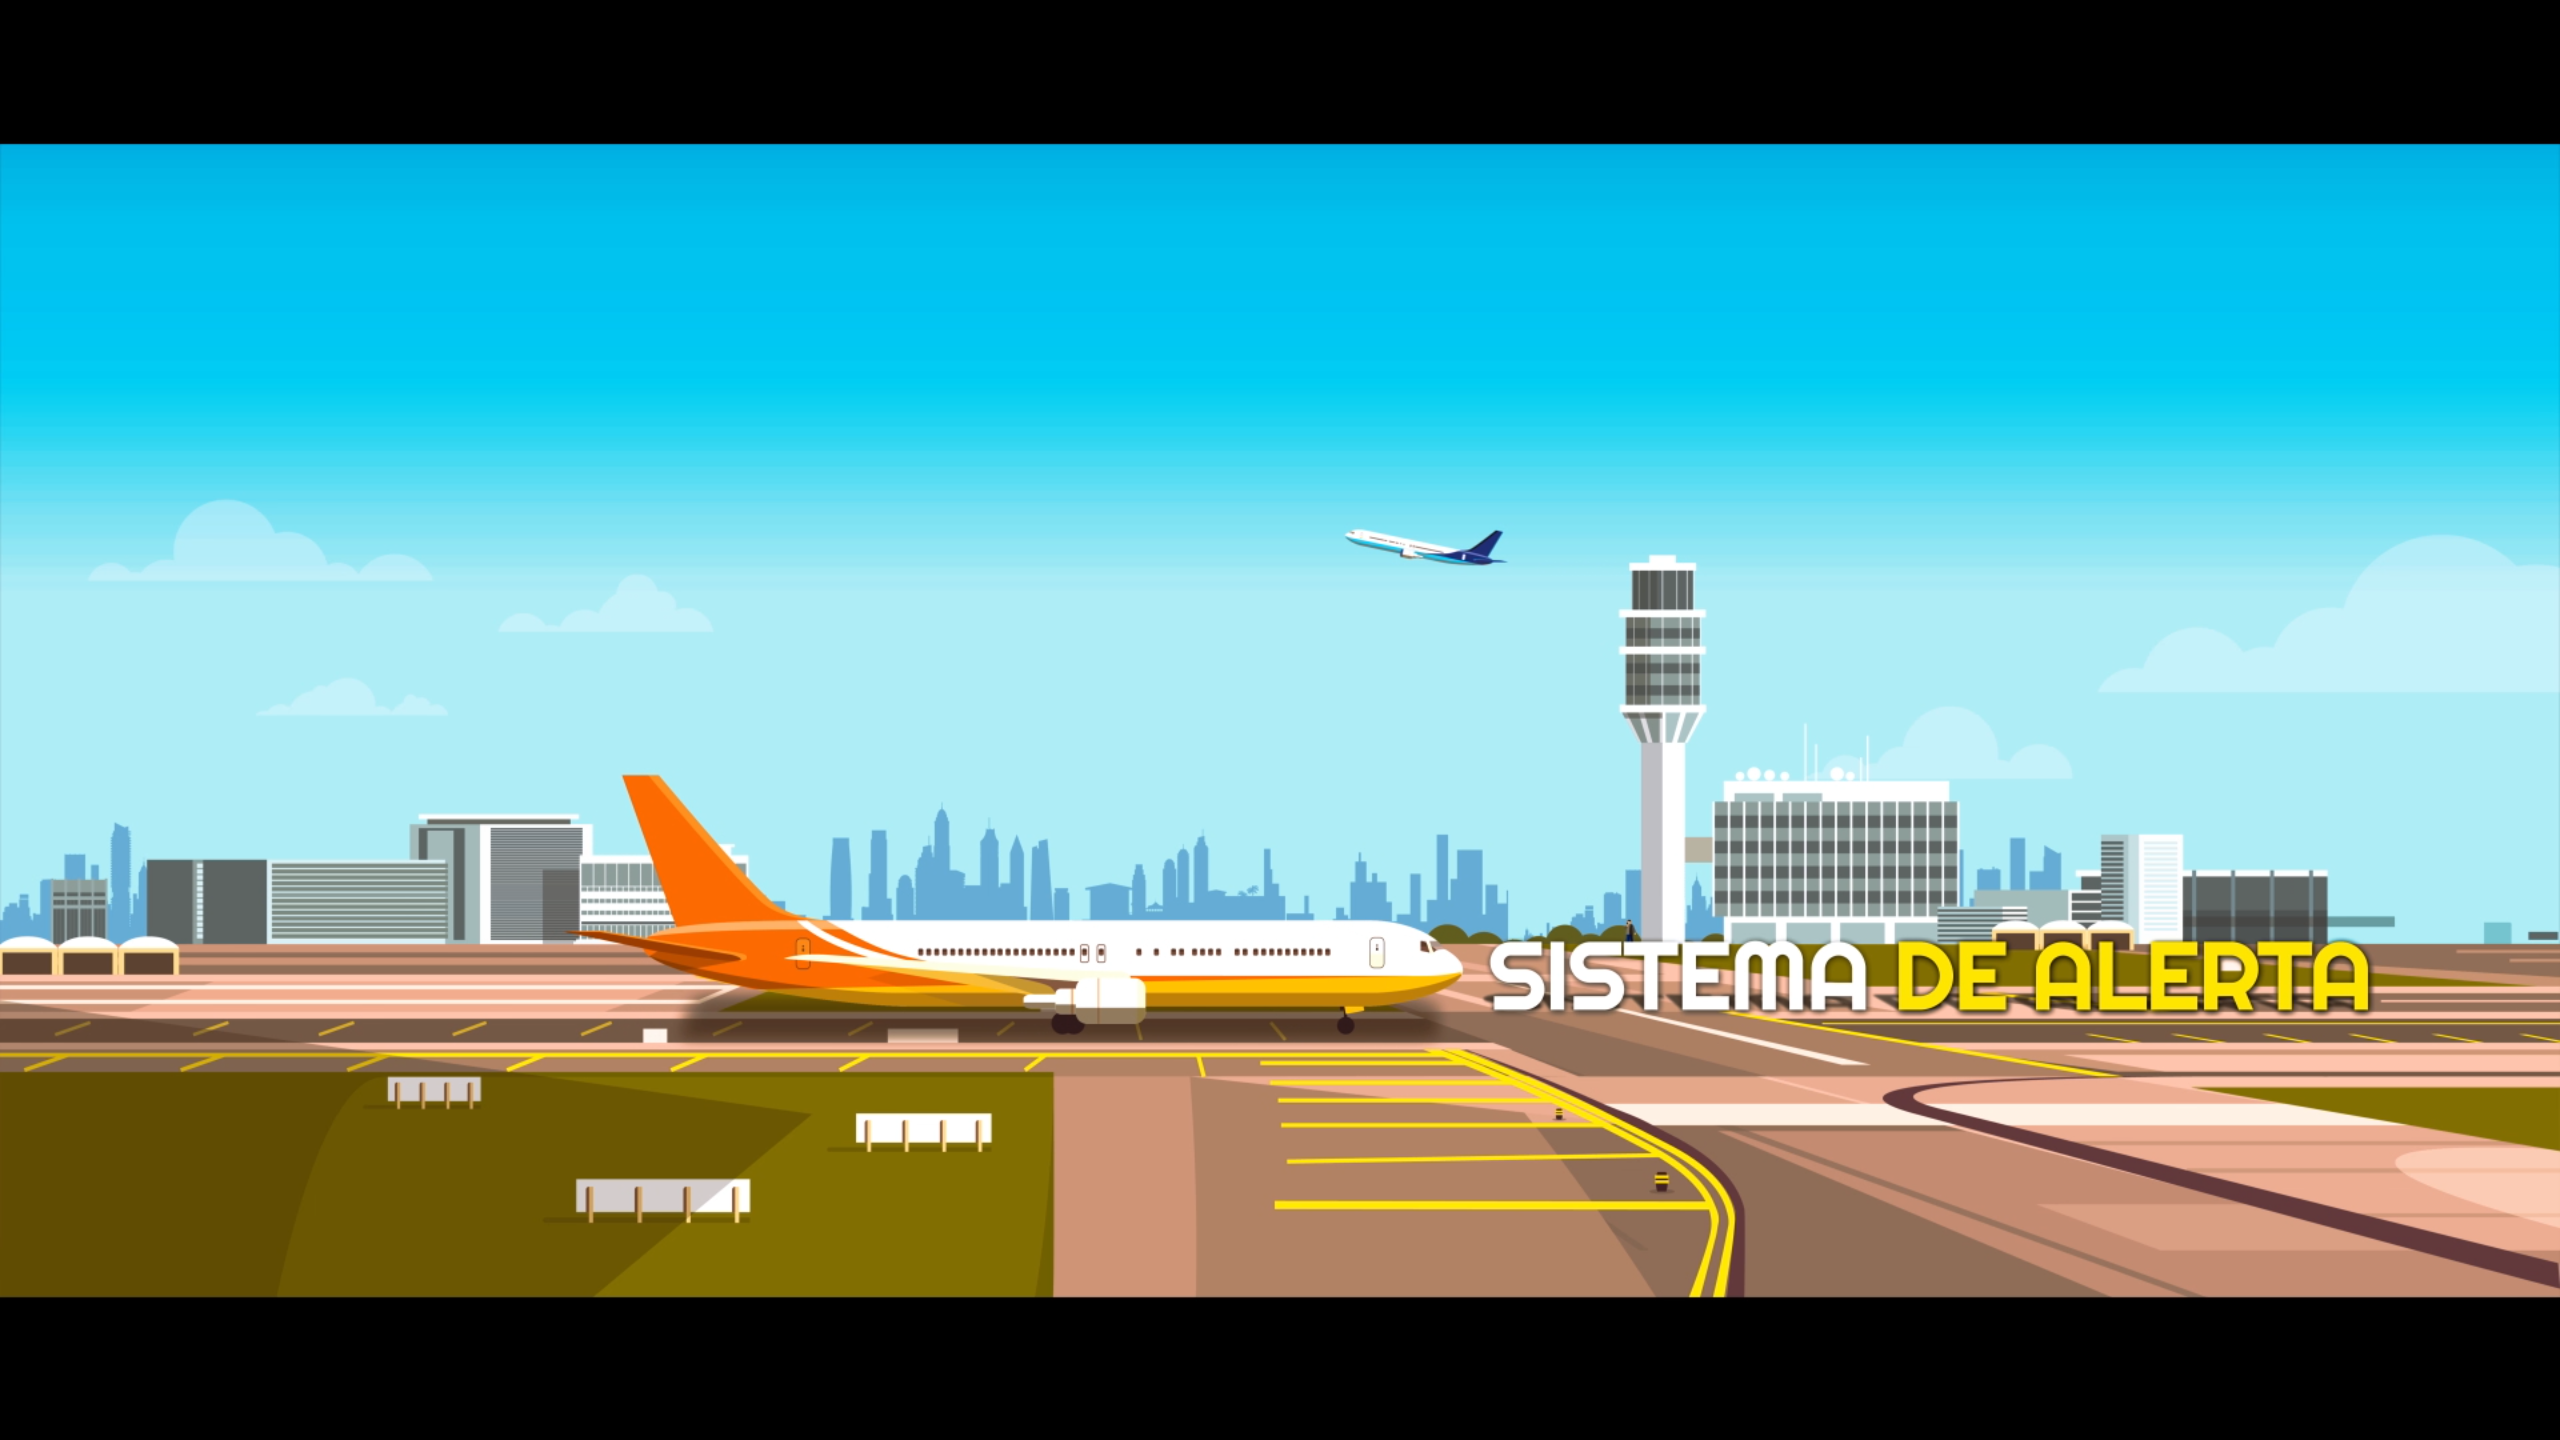 Sistema de alerta masiva para aeropuertos